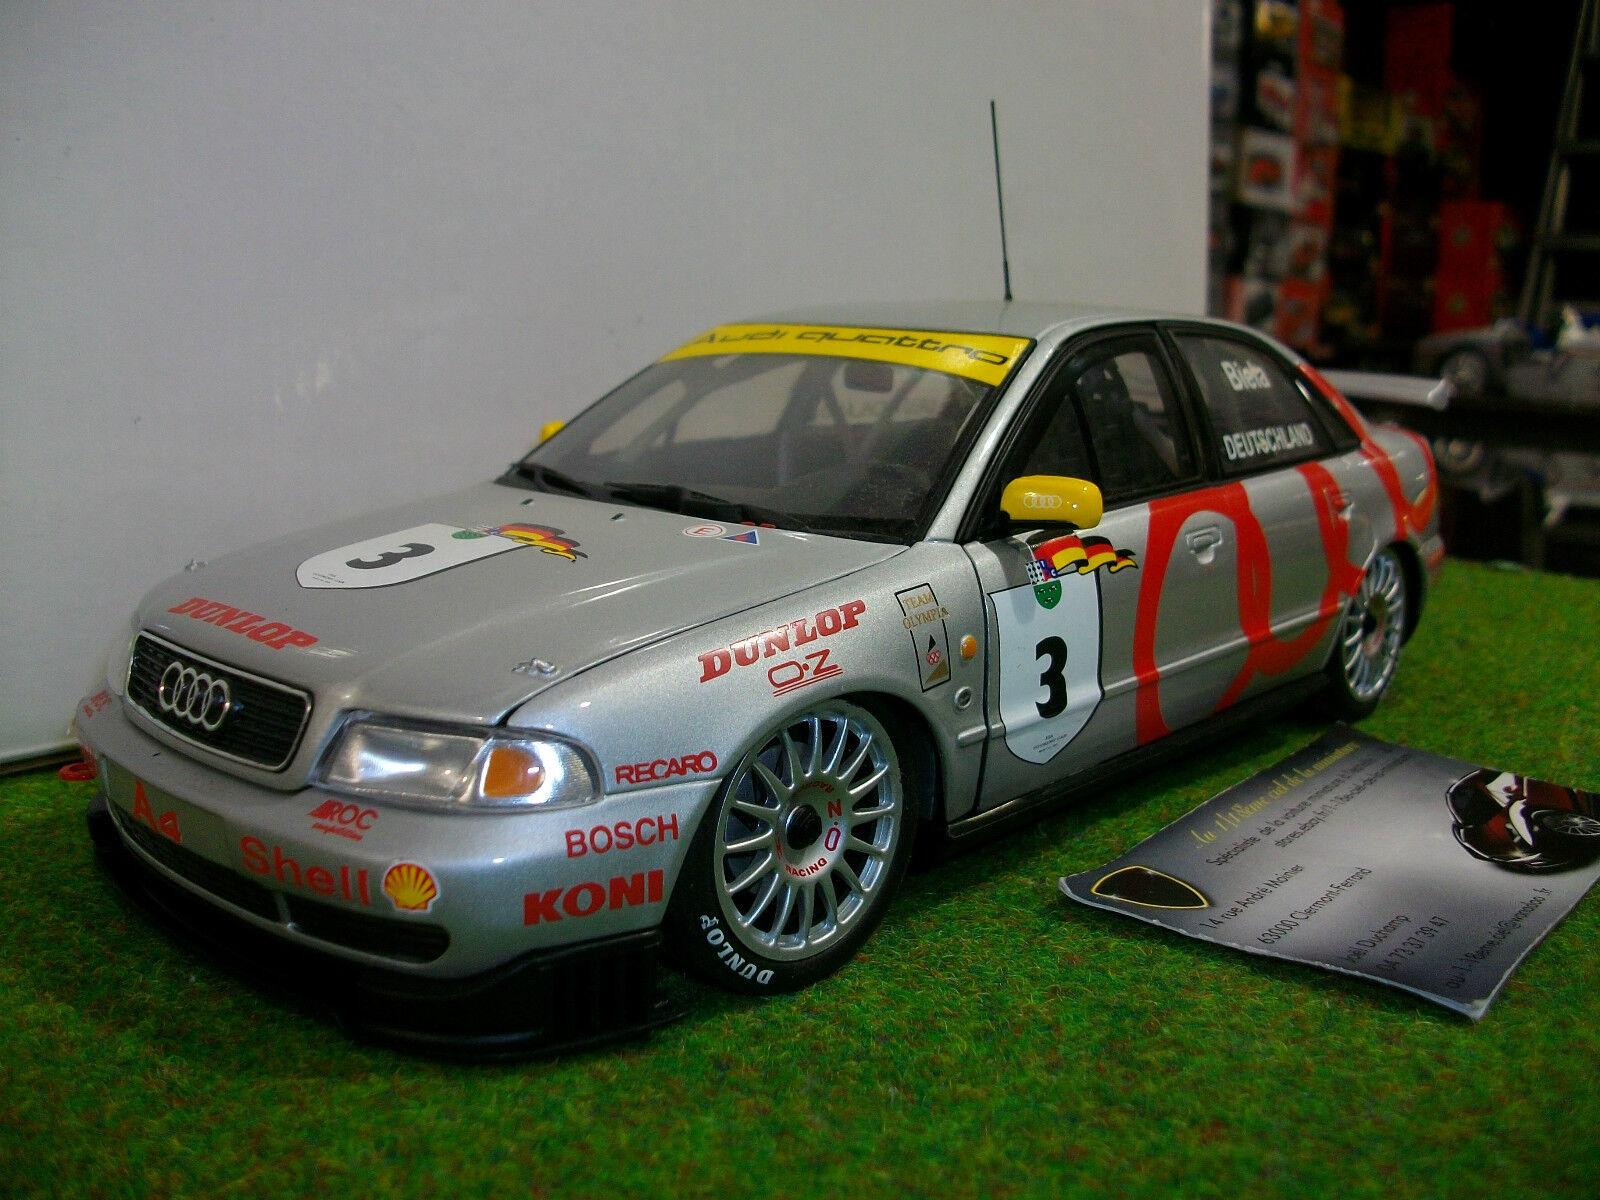 AUDI A4 STW Touring Car World Champion 1995 DTM 1 18 UT Models voiture miniatu